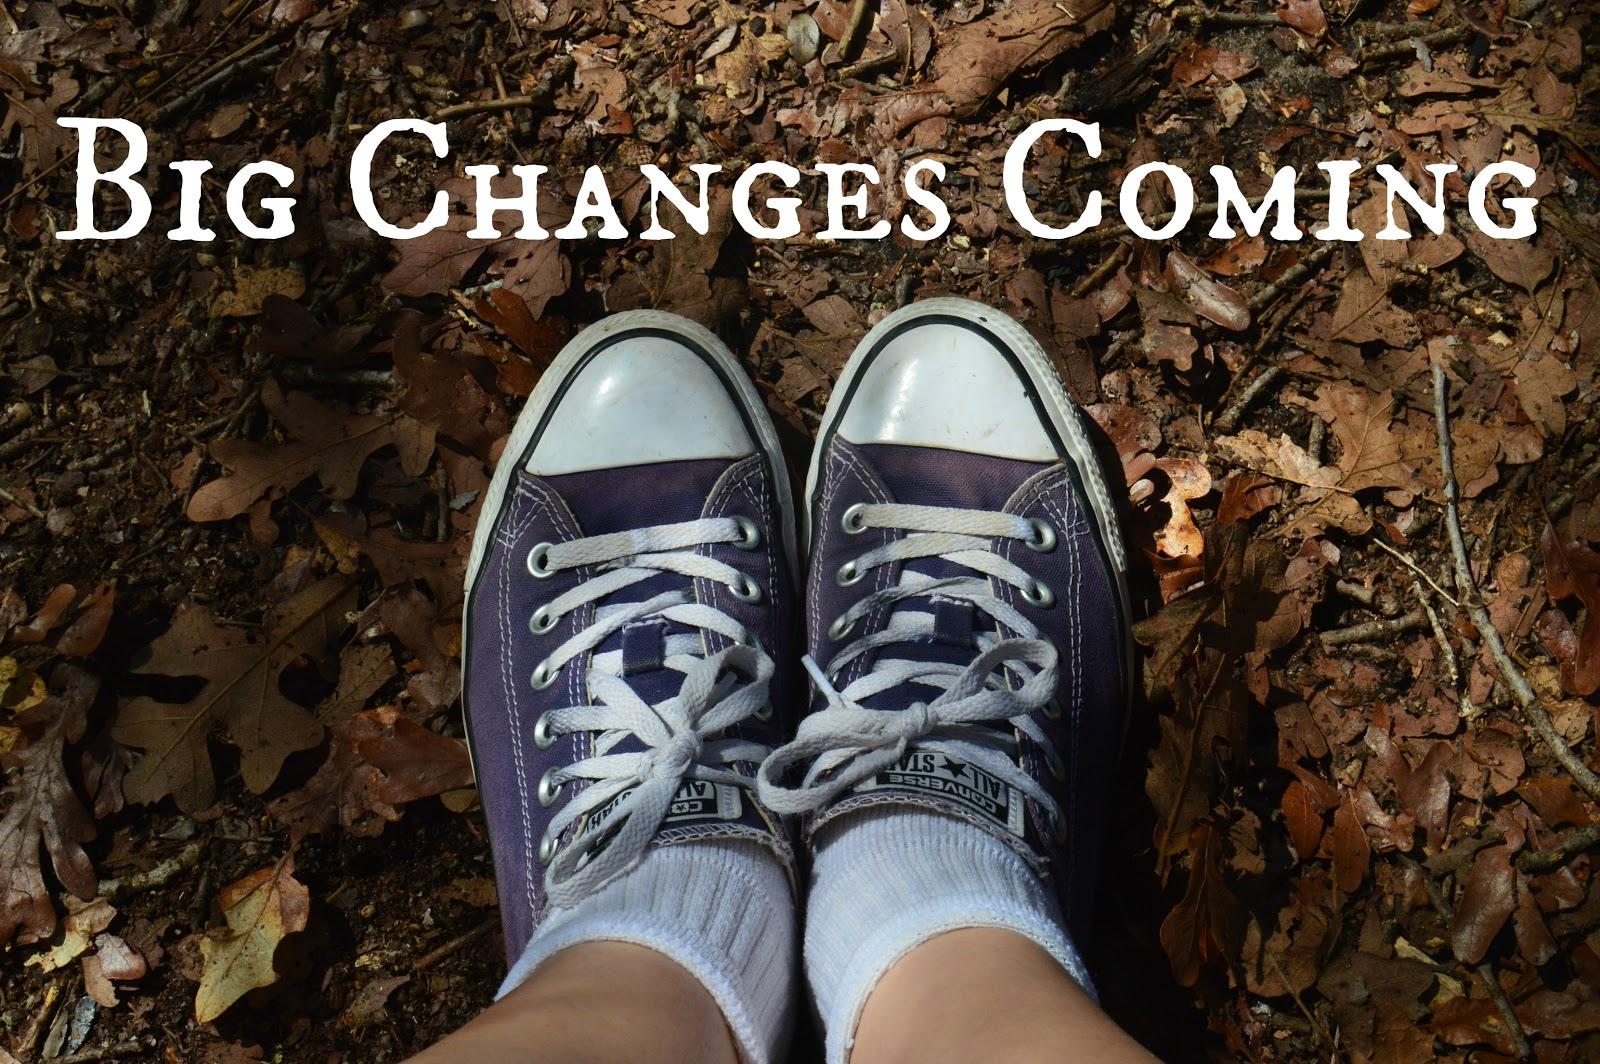 Extraordinary Changes ile ilgili görsel sonucu